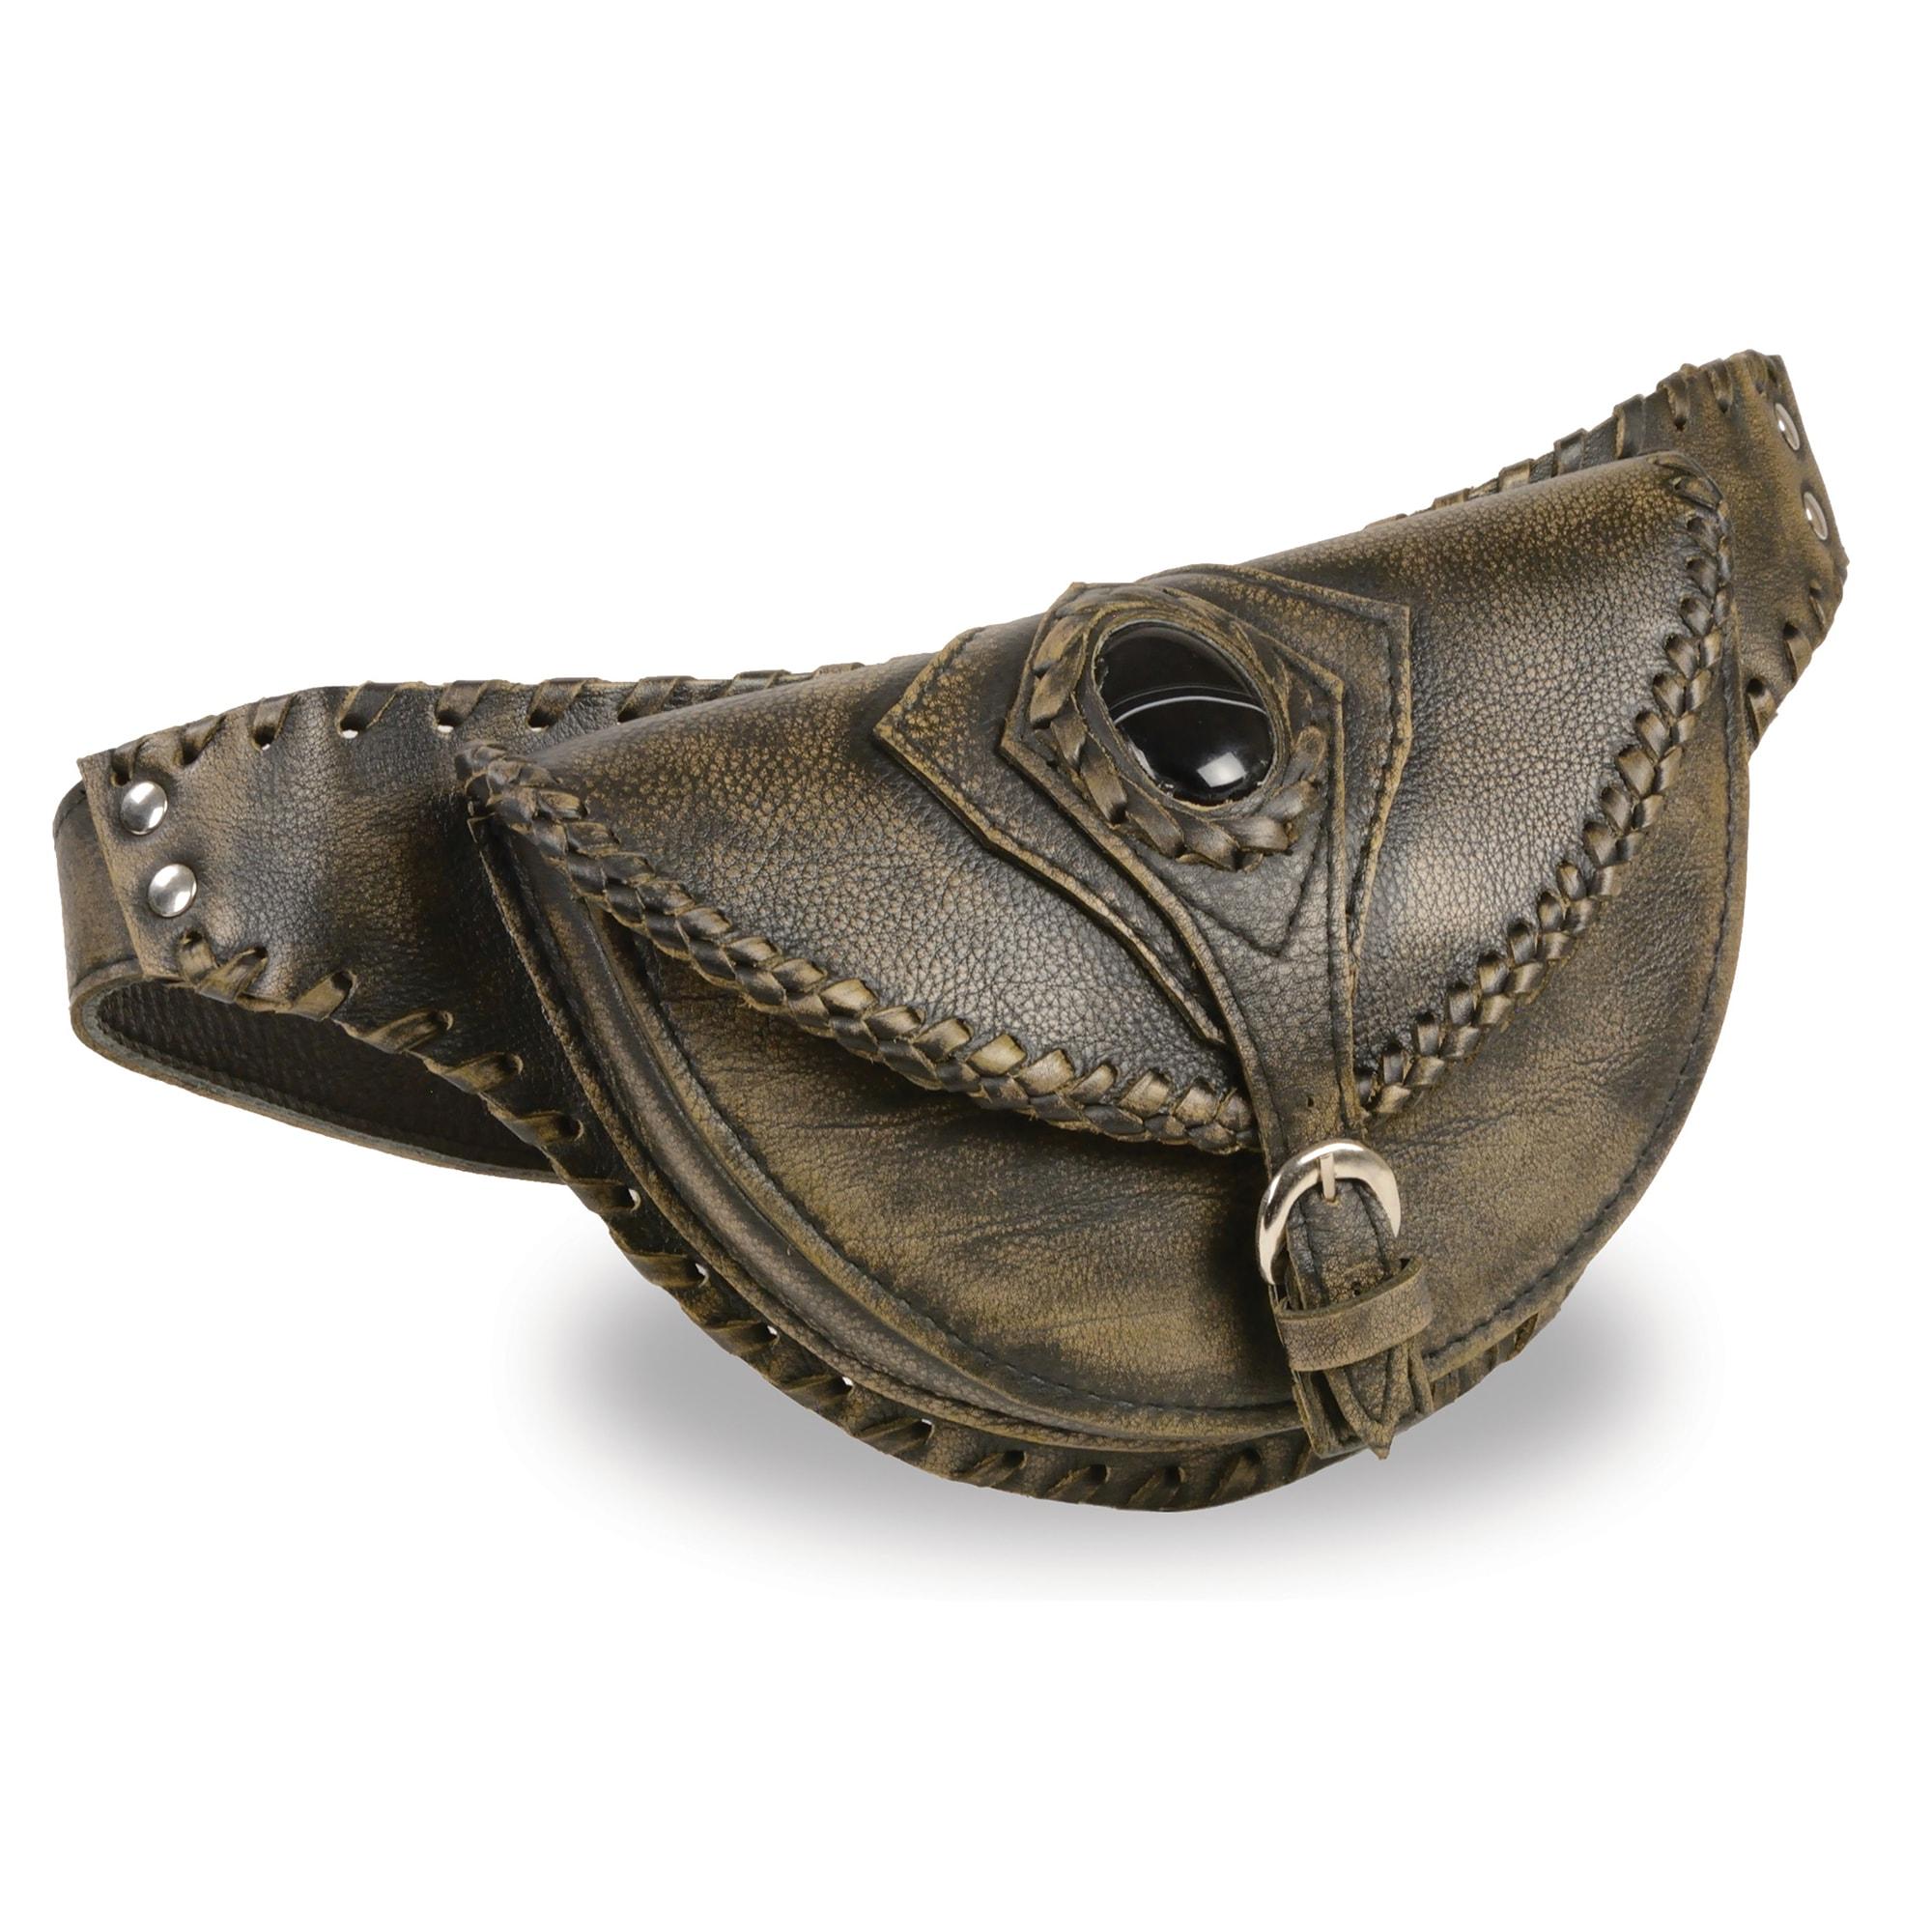 Unisex Hand Braided Leather Hip Bag W Stone Inlay Amp Gun